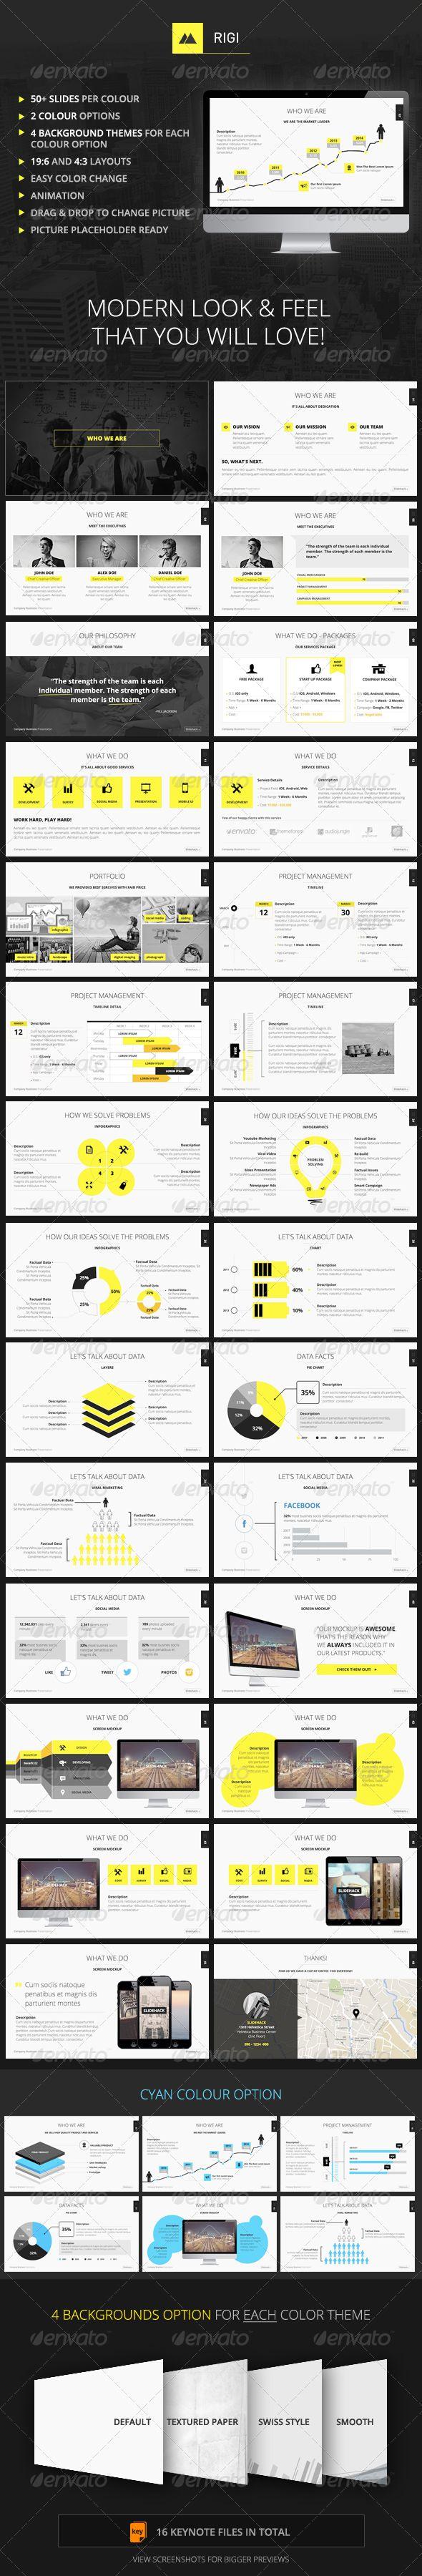 RIGI - Keynote Template — Keynote KEY #simple #infographics • Available here → https://graphicriver.net/item/rigi-keynote-template/6928908?ref=pxcr